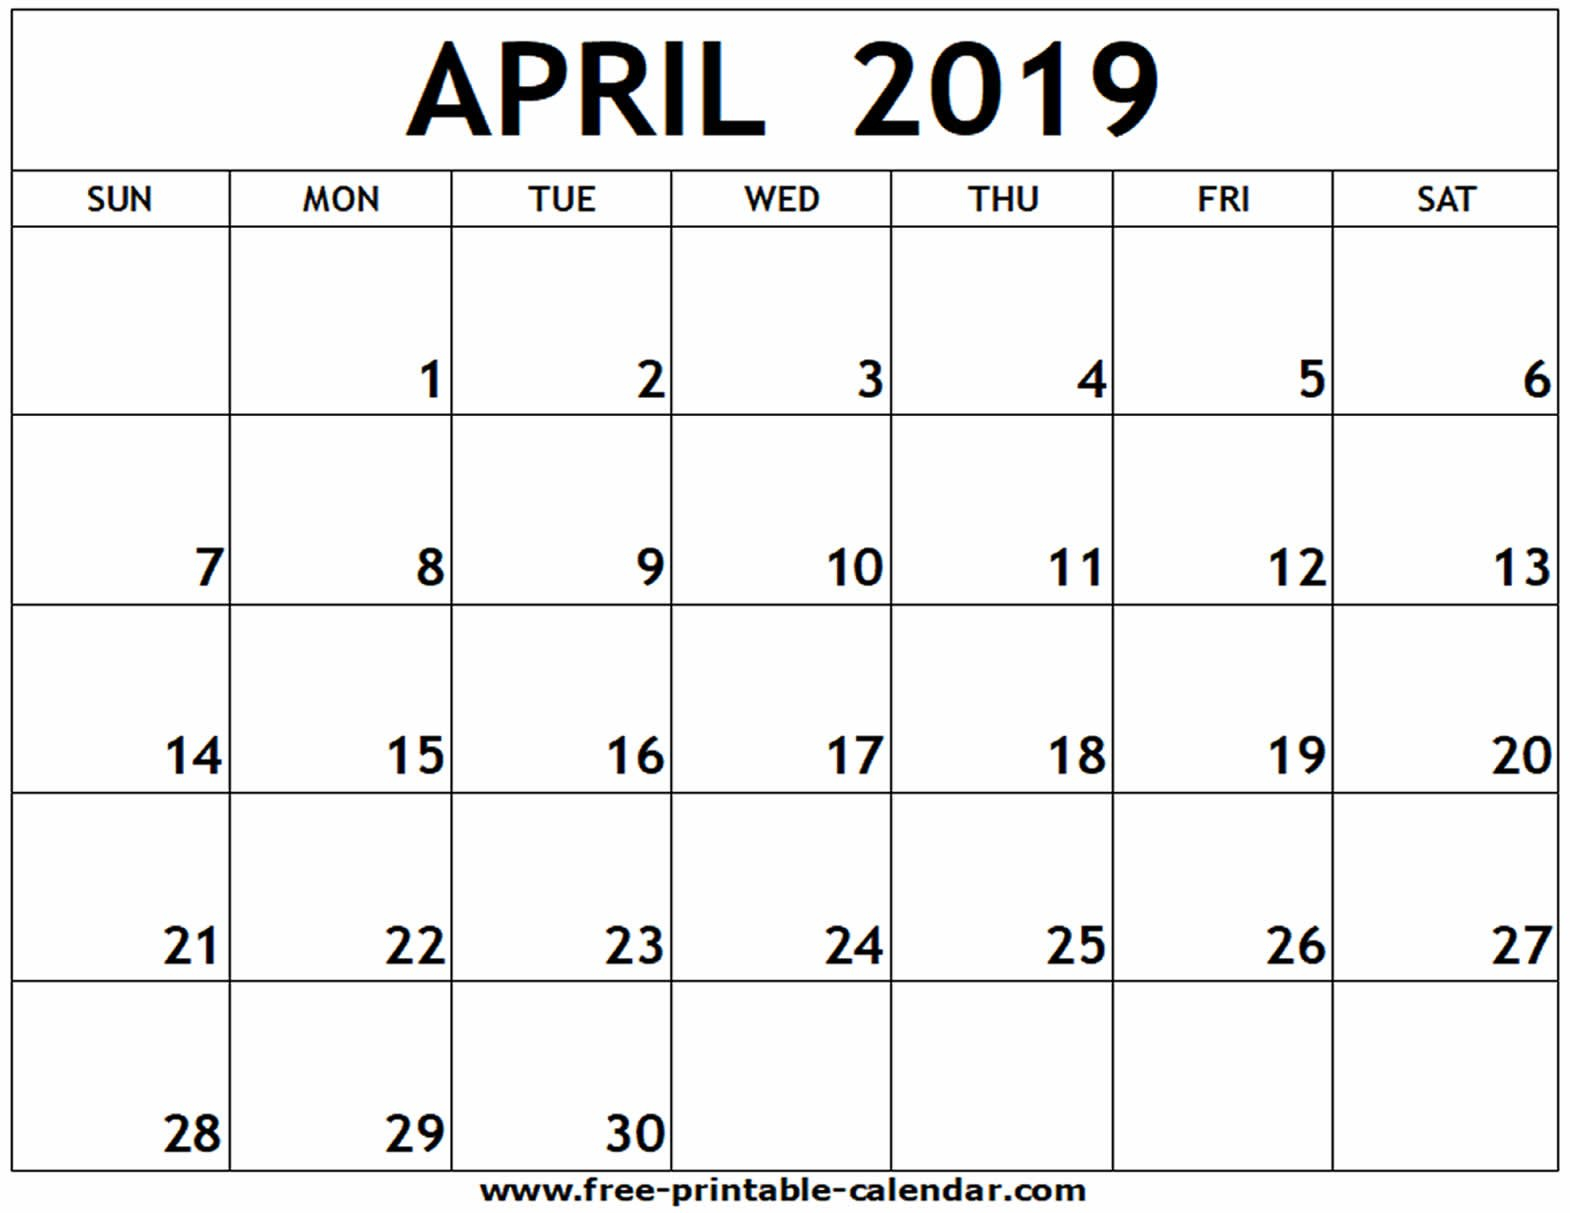 April 2019 Printable Calendar - Free-Printable-Calendar Calendar 2019 April Printable